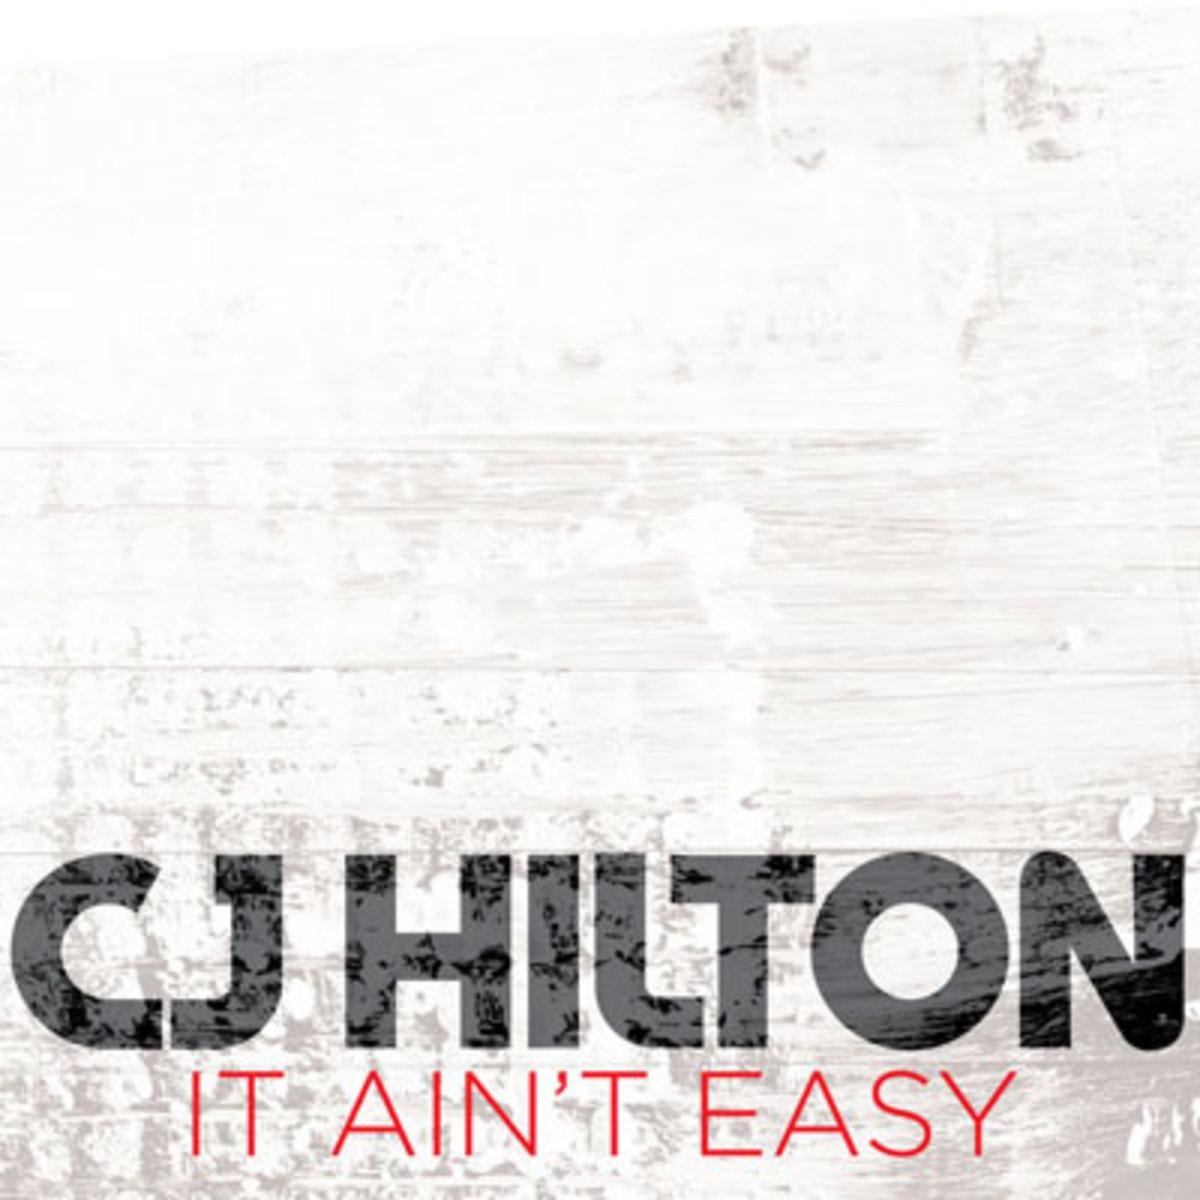 cjhilton-itainteasy.jpg